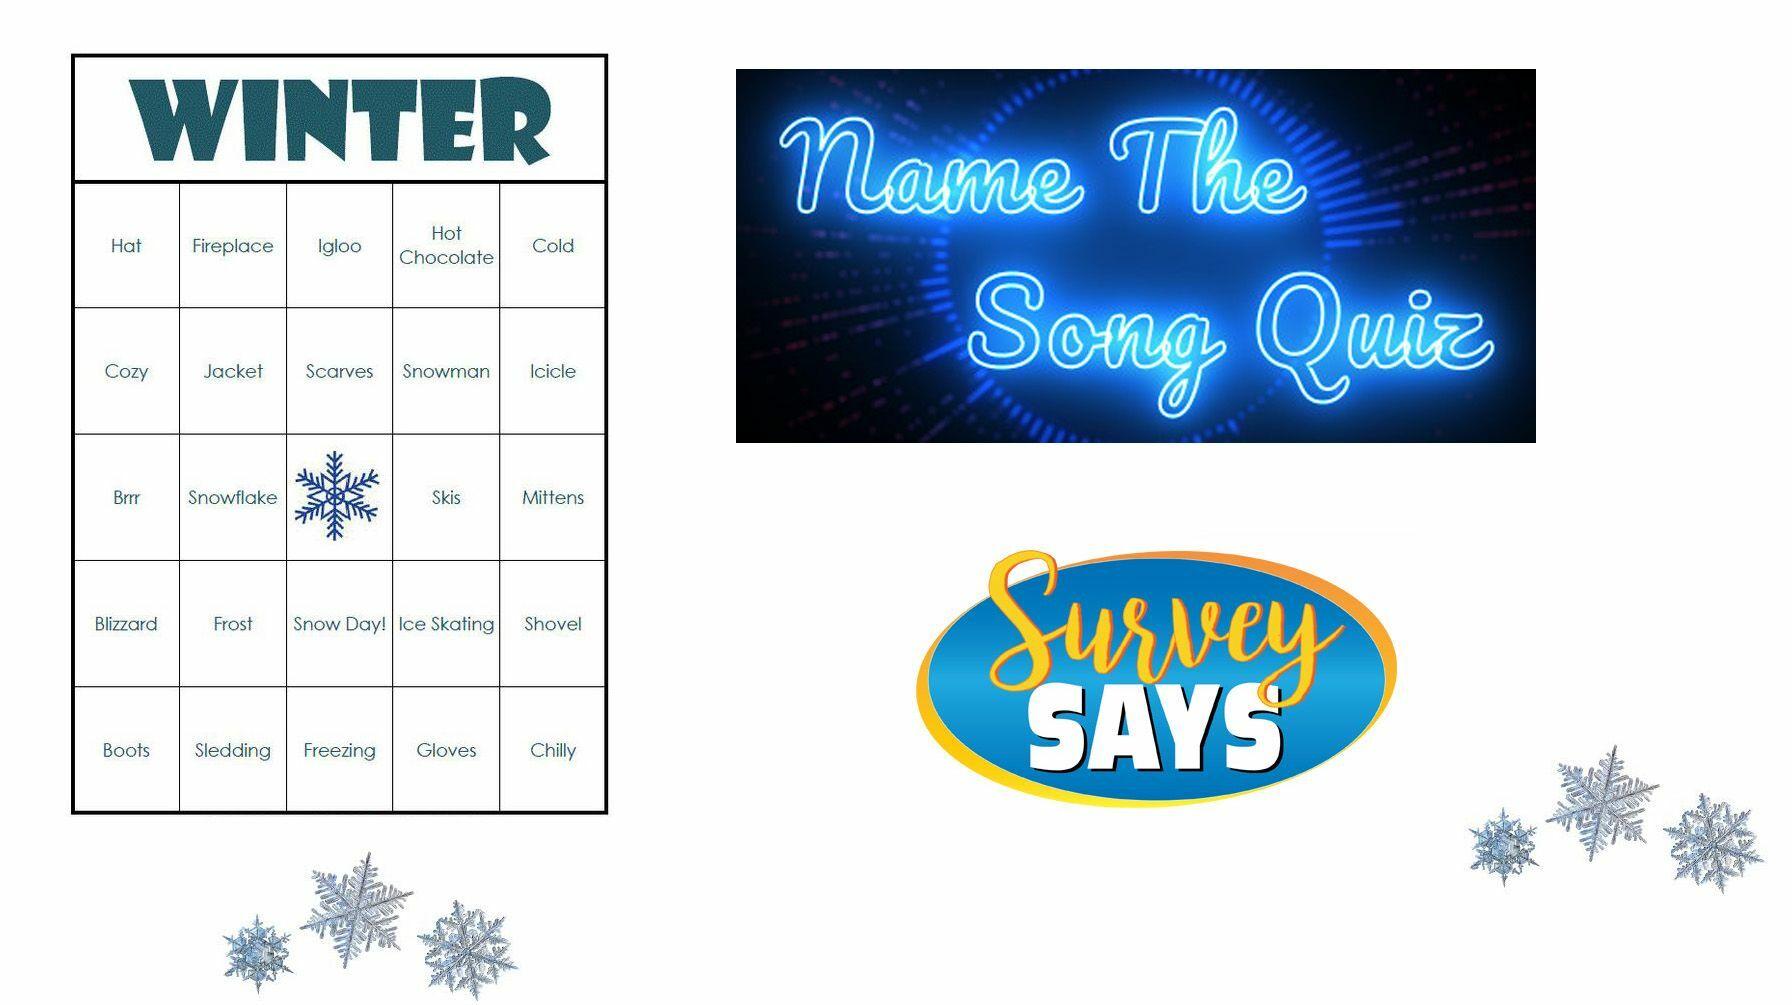 Name that Song, Word Bingo, Survey Says- Fun & Games Virtual Event